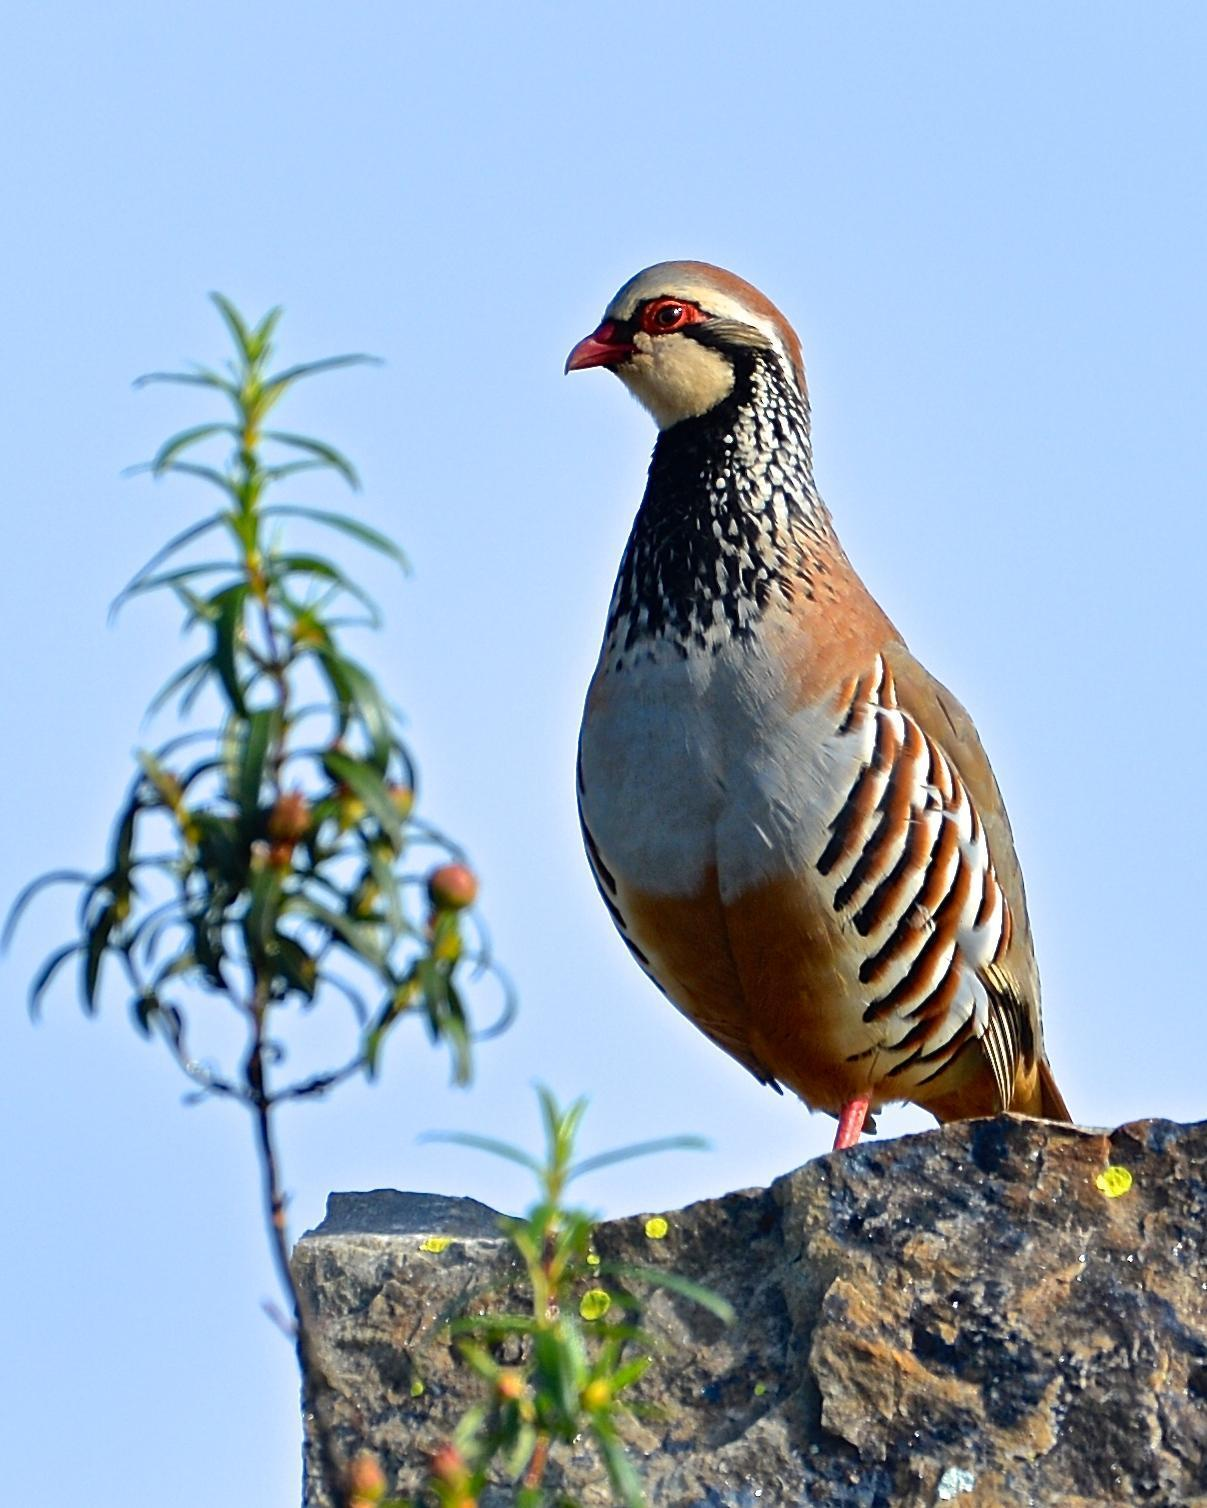 Red-legged Partridge Photo by Gerald Friesen